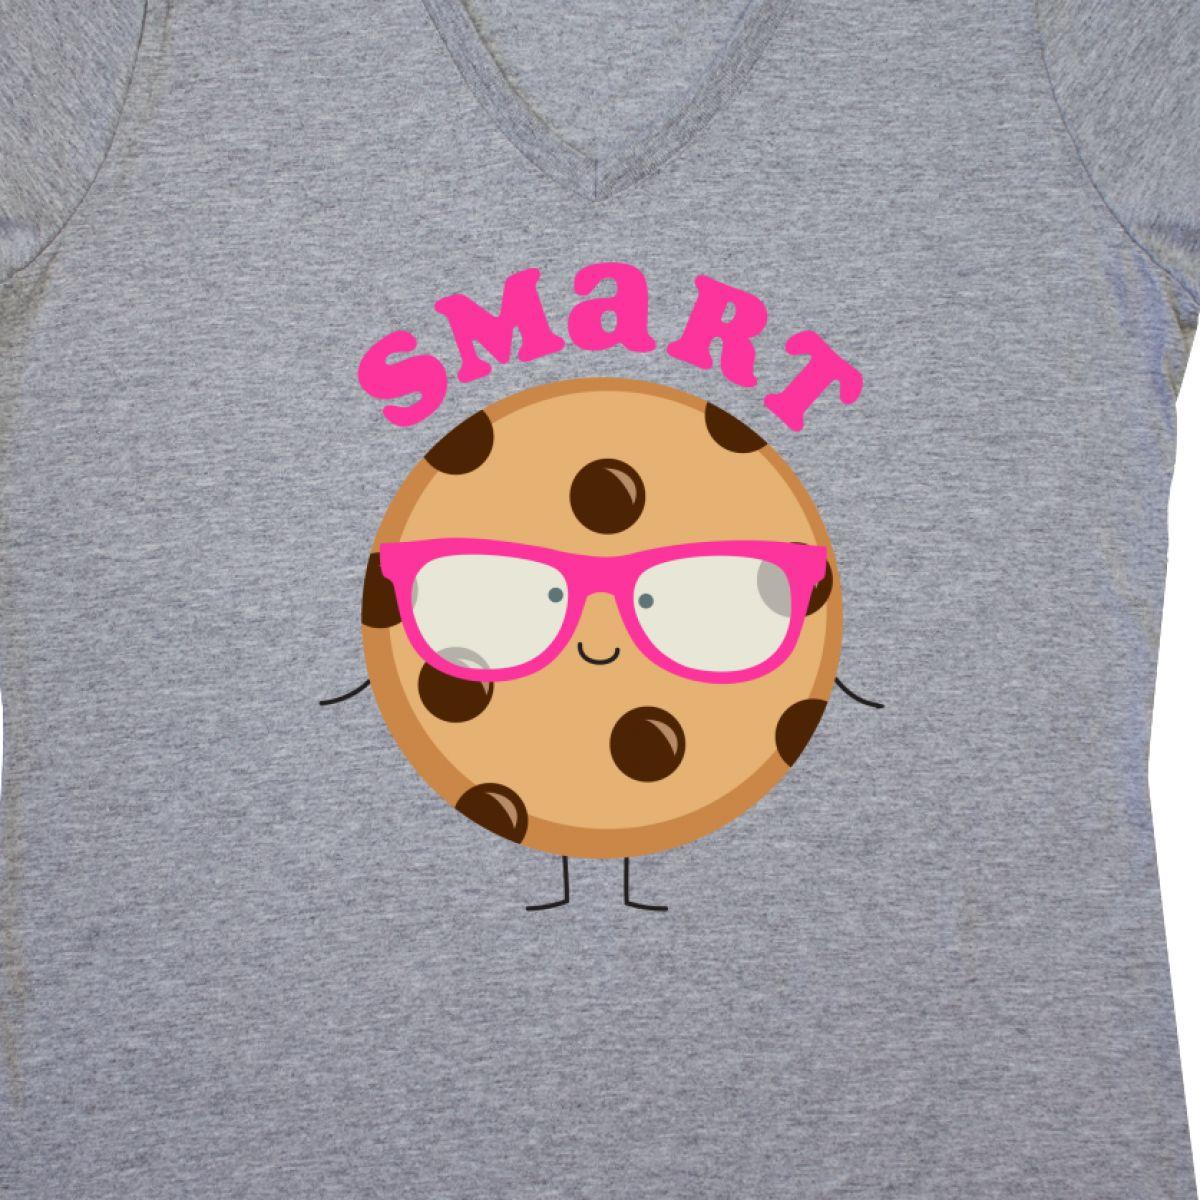 13c760bb42f Inktastic Smart Cookie Women s V-Neck T-Shirt Chocolate Chip Nerd ...